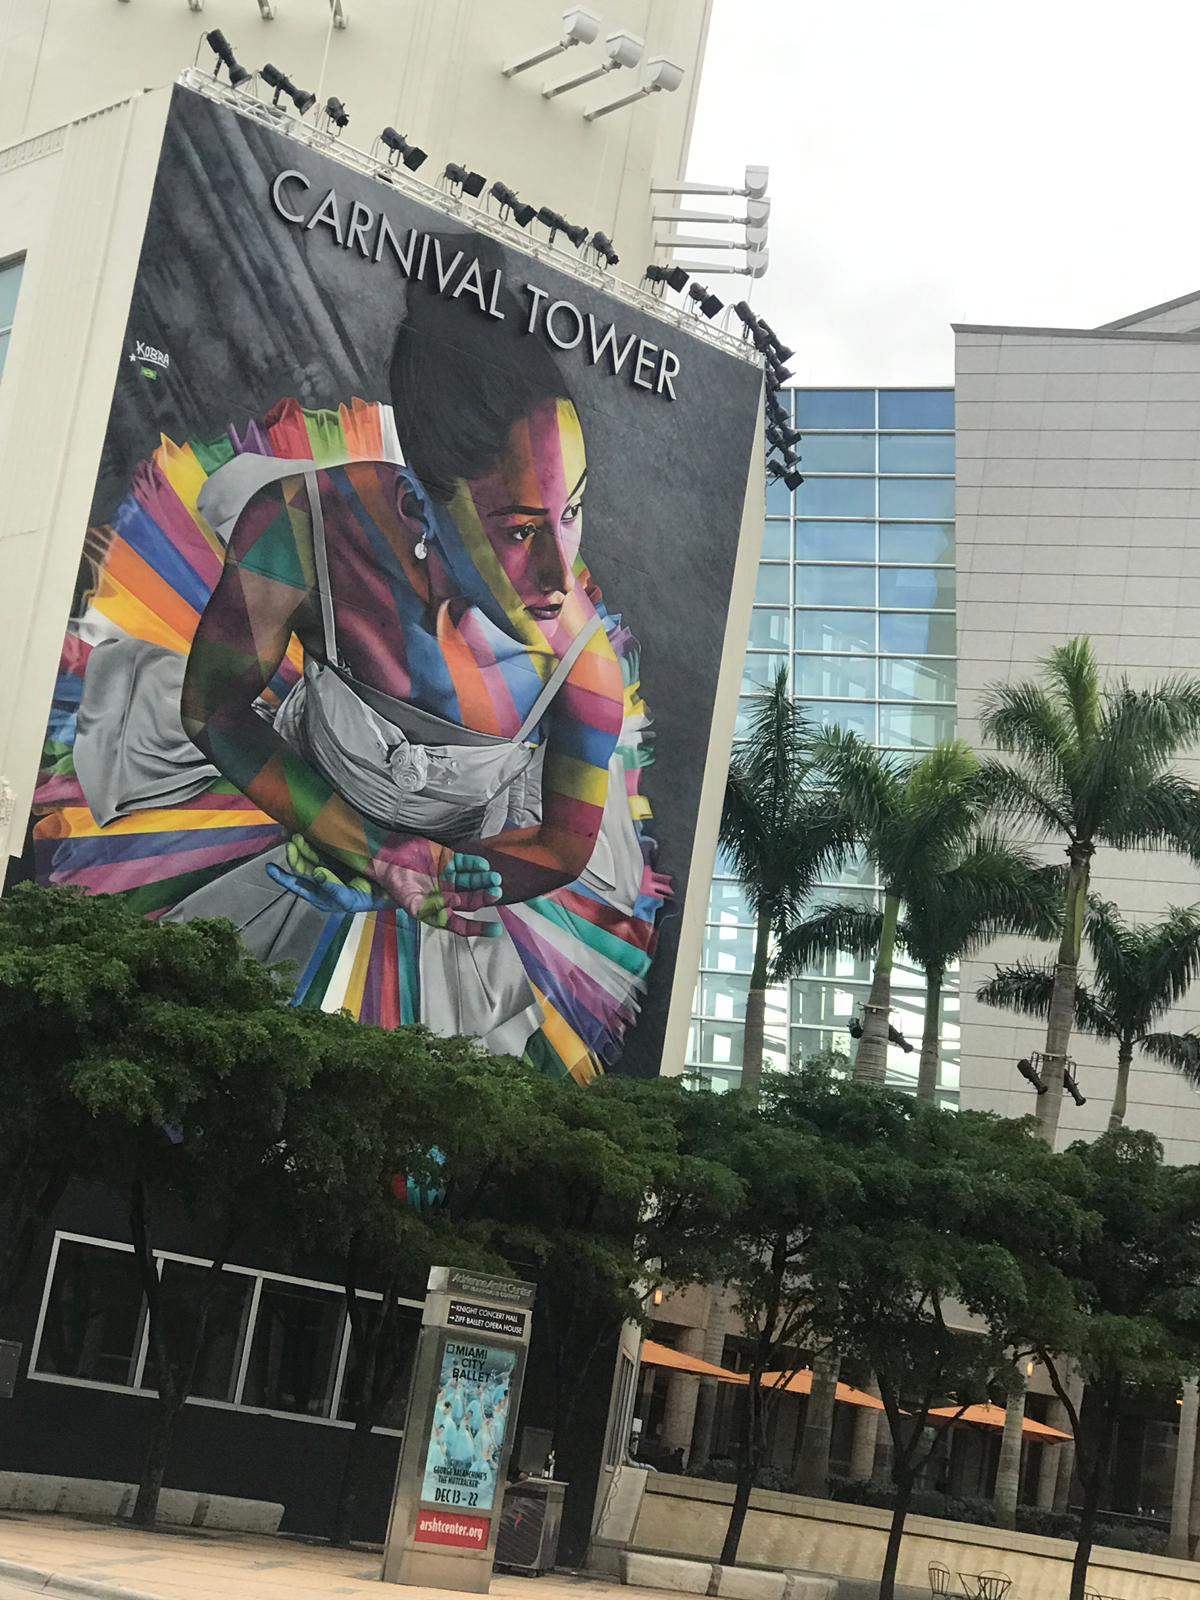 Miami street art, Miami mural, ballerina, ballet, ballerina painting, miami colours, miami sights, vistas de miami, staceessmoothie, stacee's smoothie, stacees smoothie